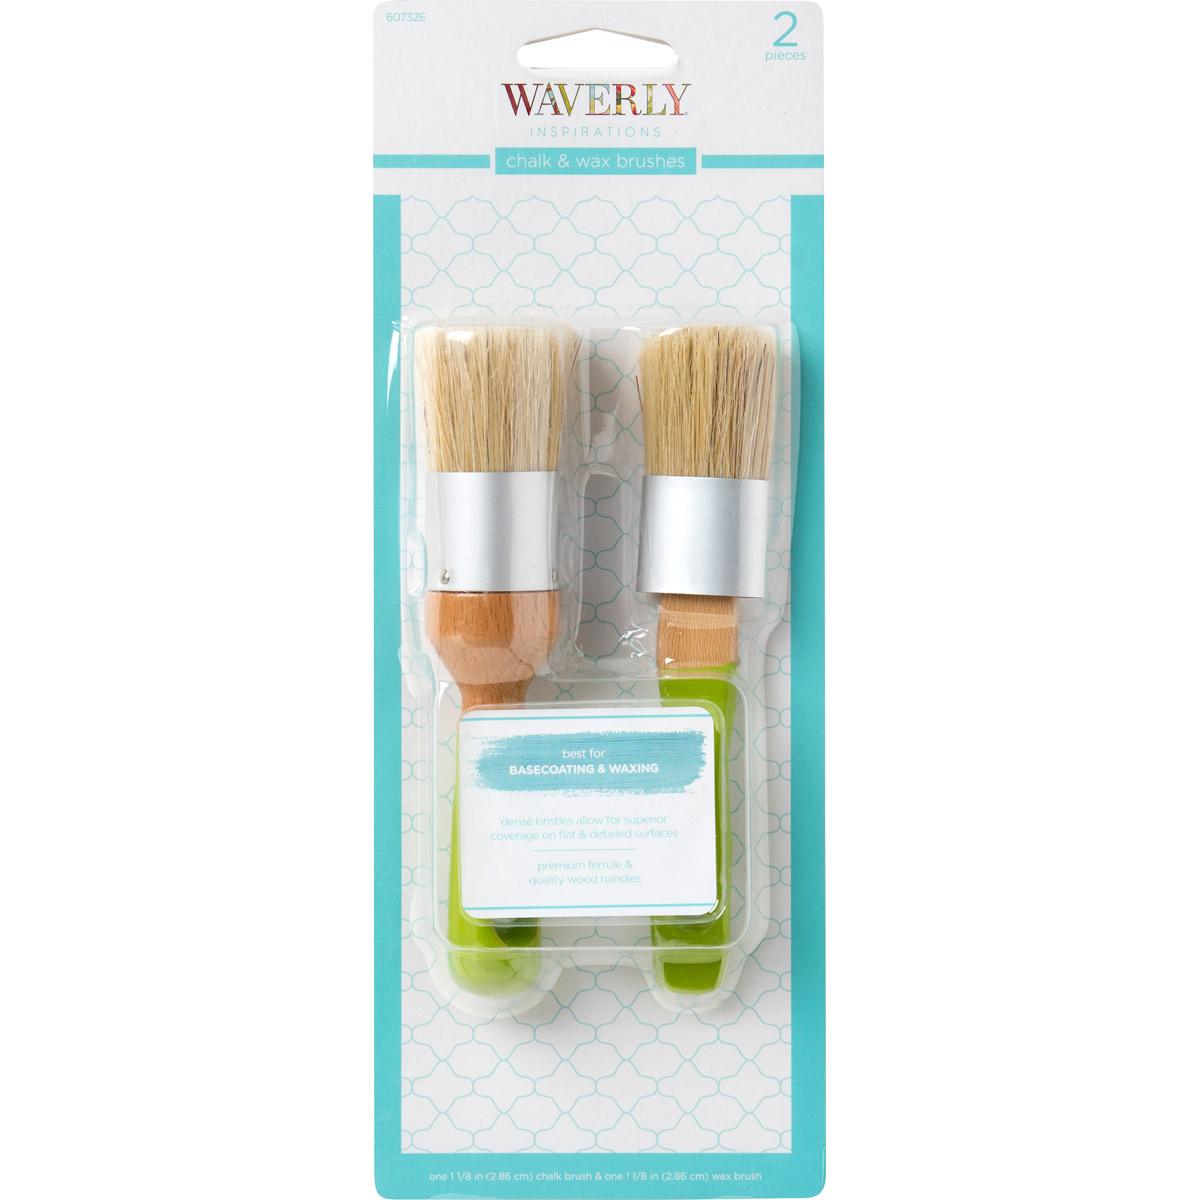 Waverly ® Inspirations Brushes - Chalk & Wax Combo